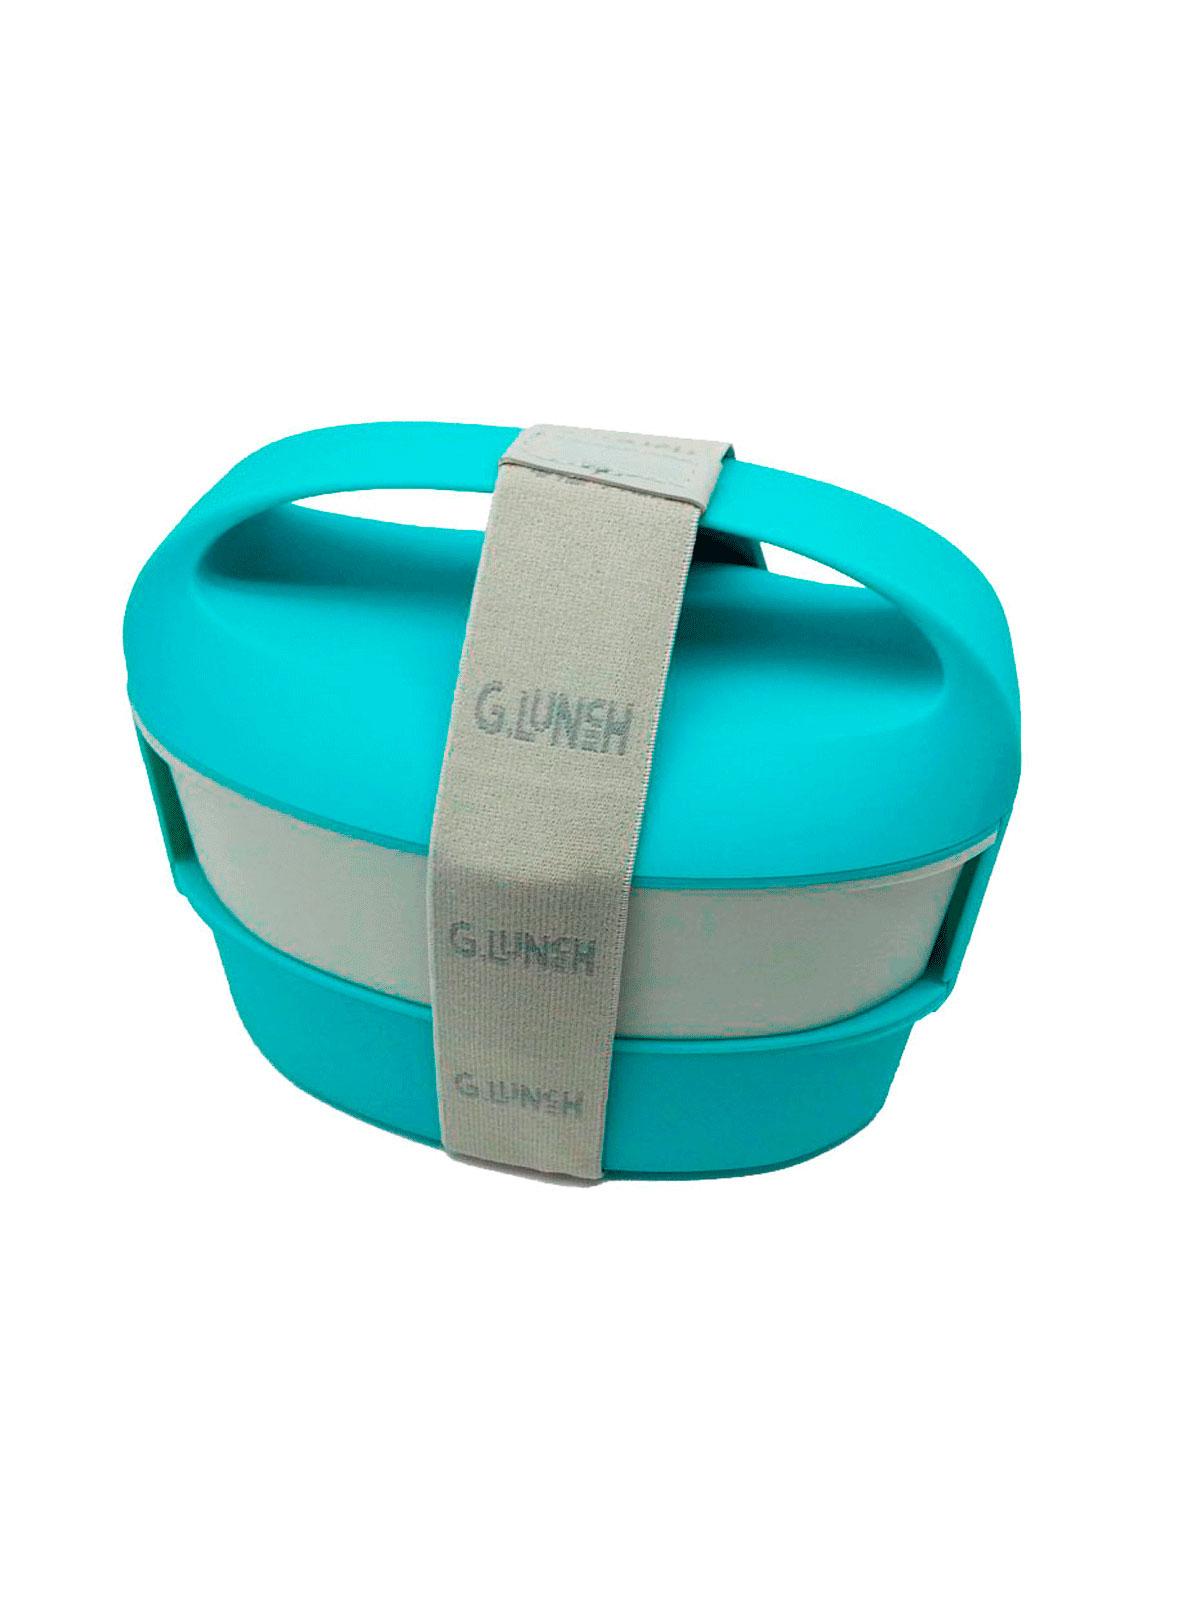 Fiambrera azul menajeando for Menaje hogar online